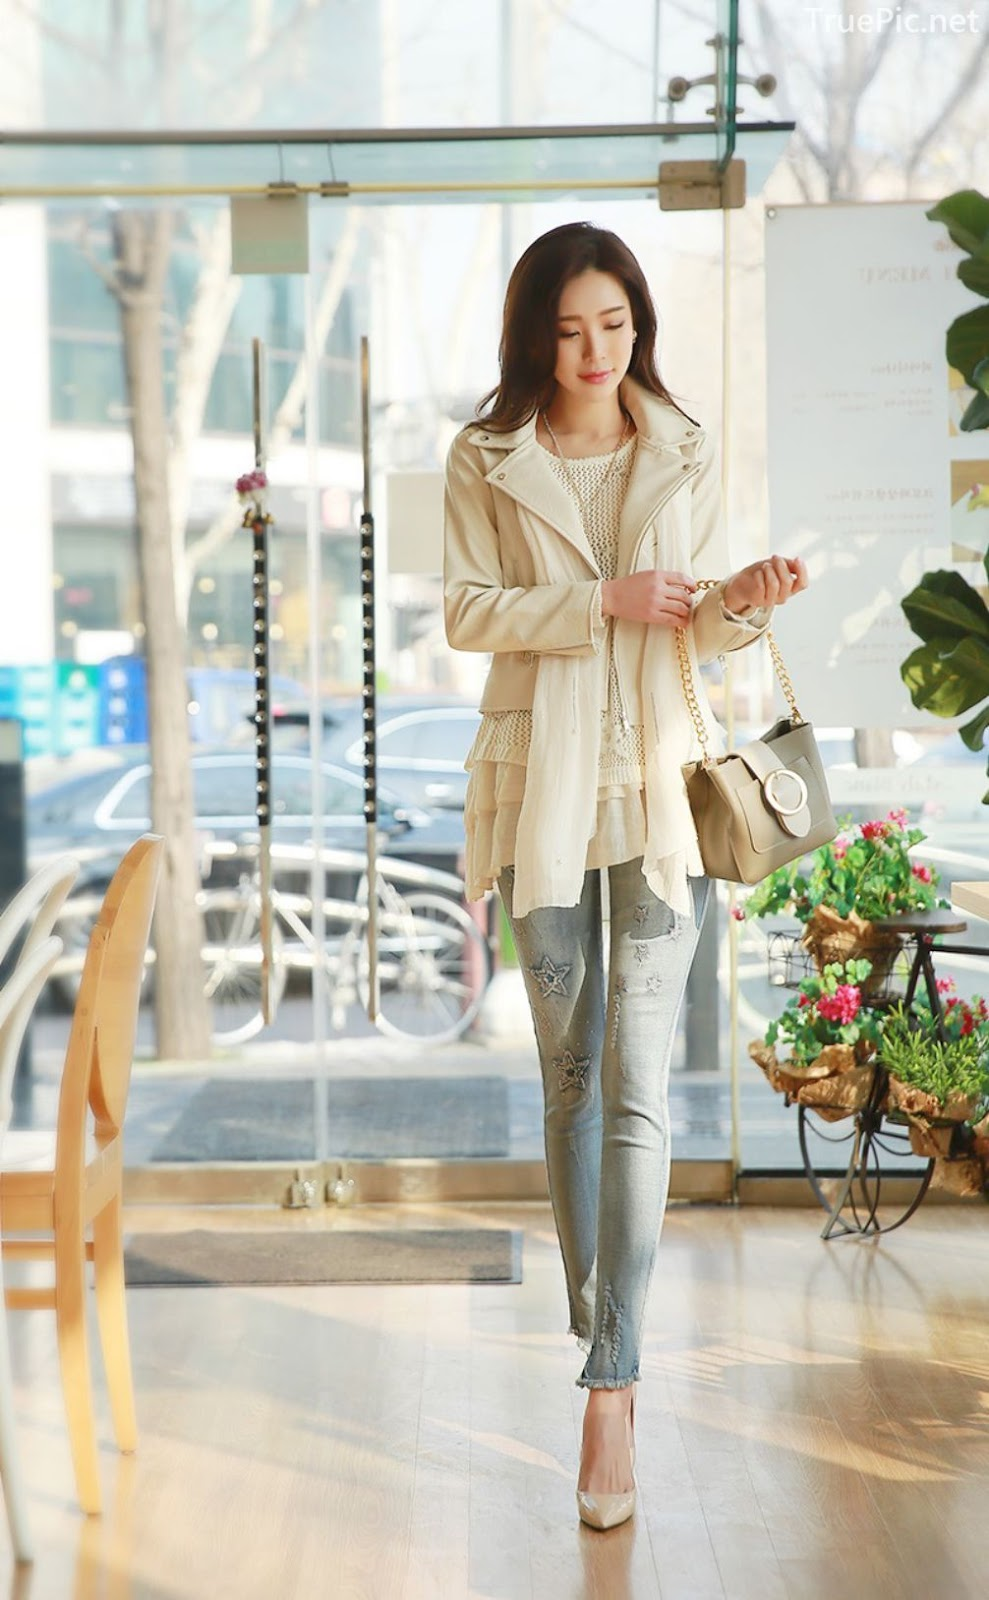 Korean Fashion Model - Park Da Hyun - Indoor Photoshoot Collection - TruePic.net - Picture 9